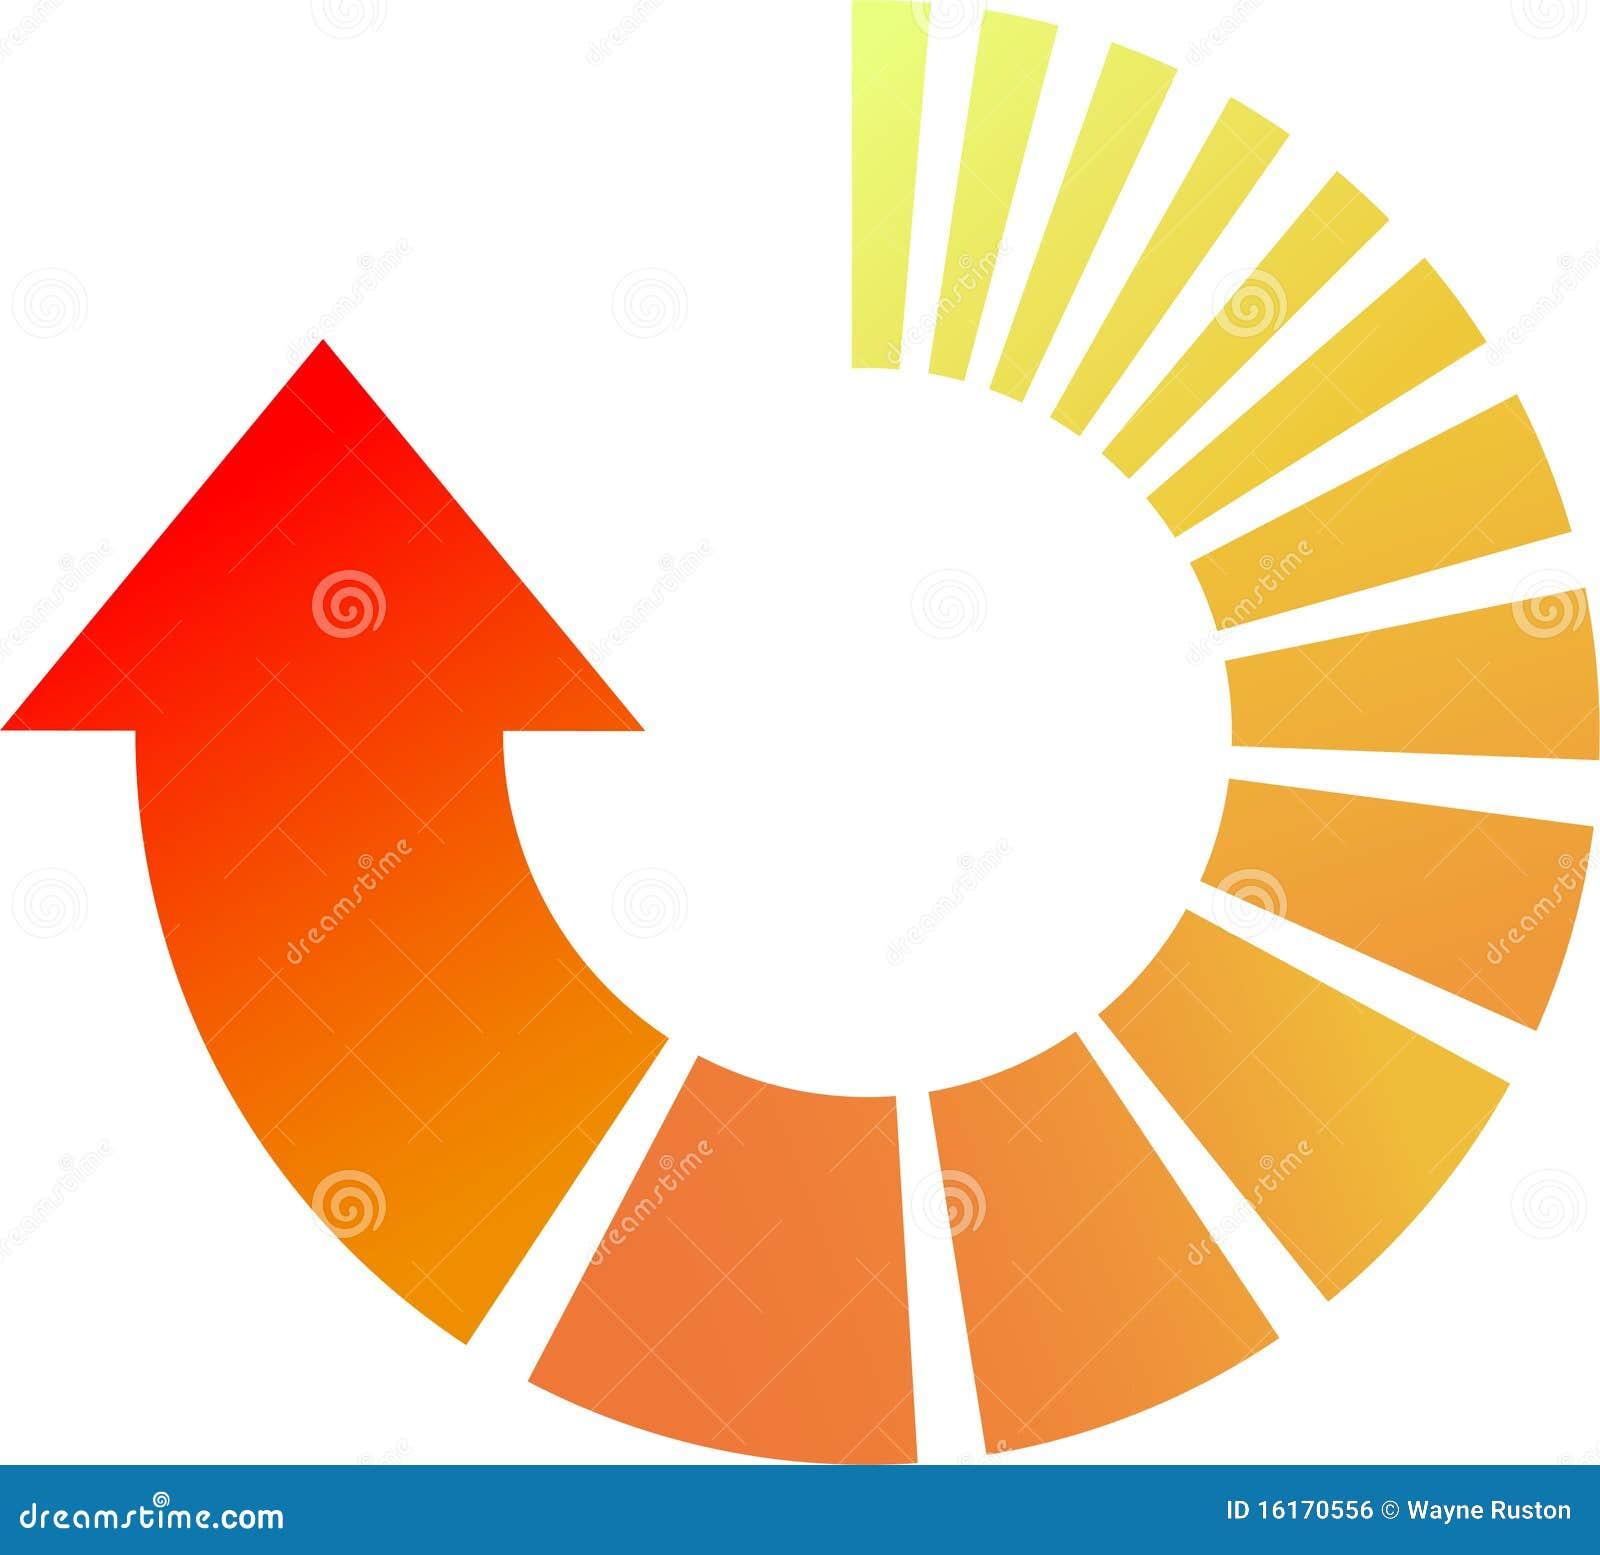 Process cycling arrow by arrow royalty free stock images image - Process Arrow Royalty Free Stock Image